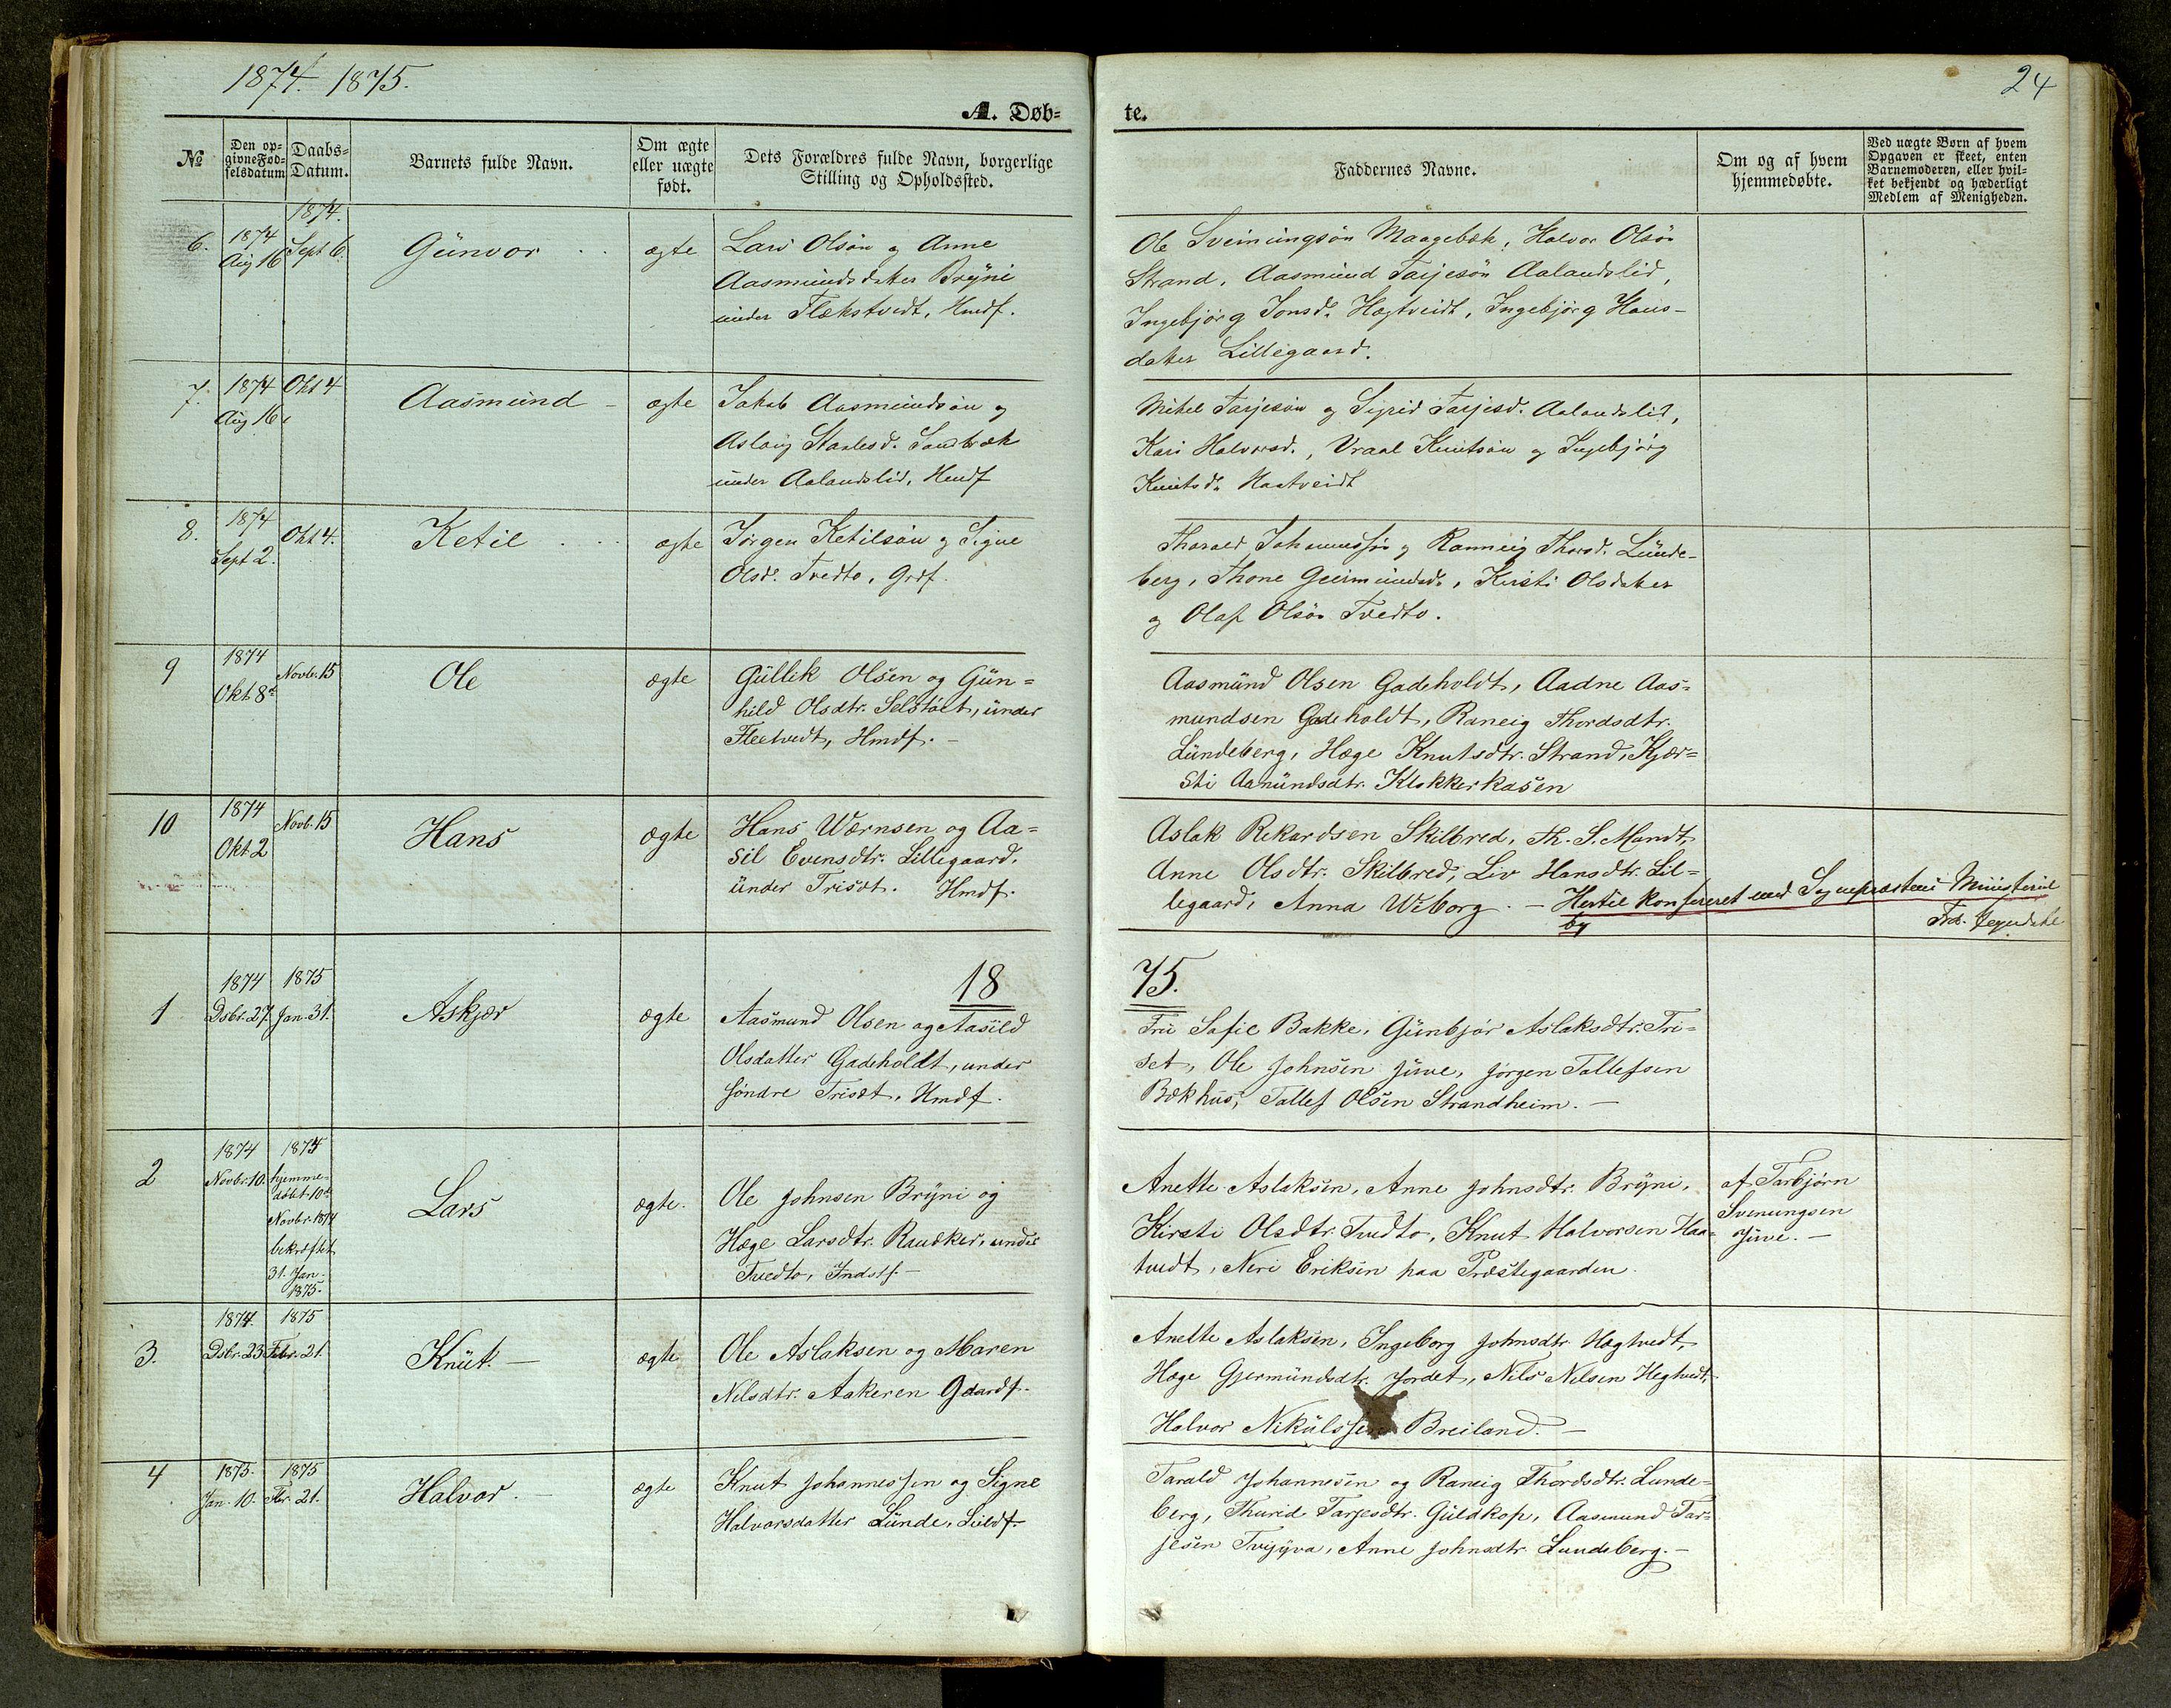 SAKO, Lårdal kirkebøker, G/Ga/L0002: Klokkerbok nr. I 2, 1861-1890, s. 24